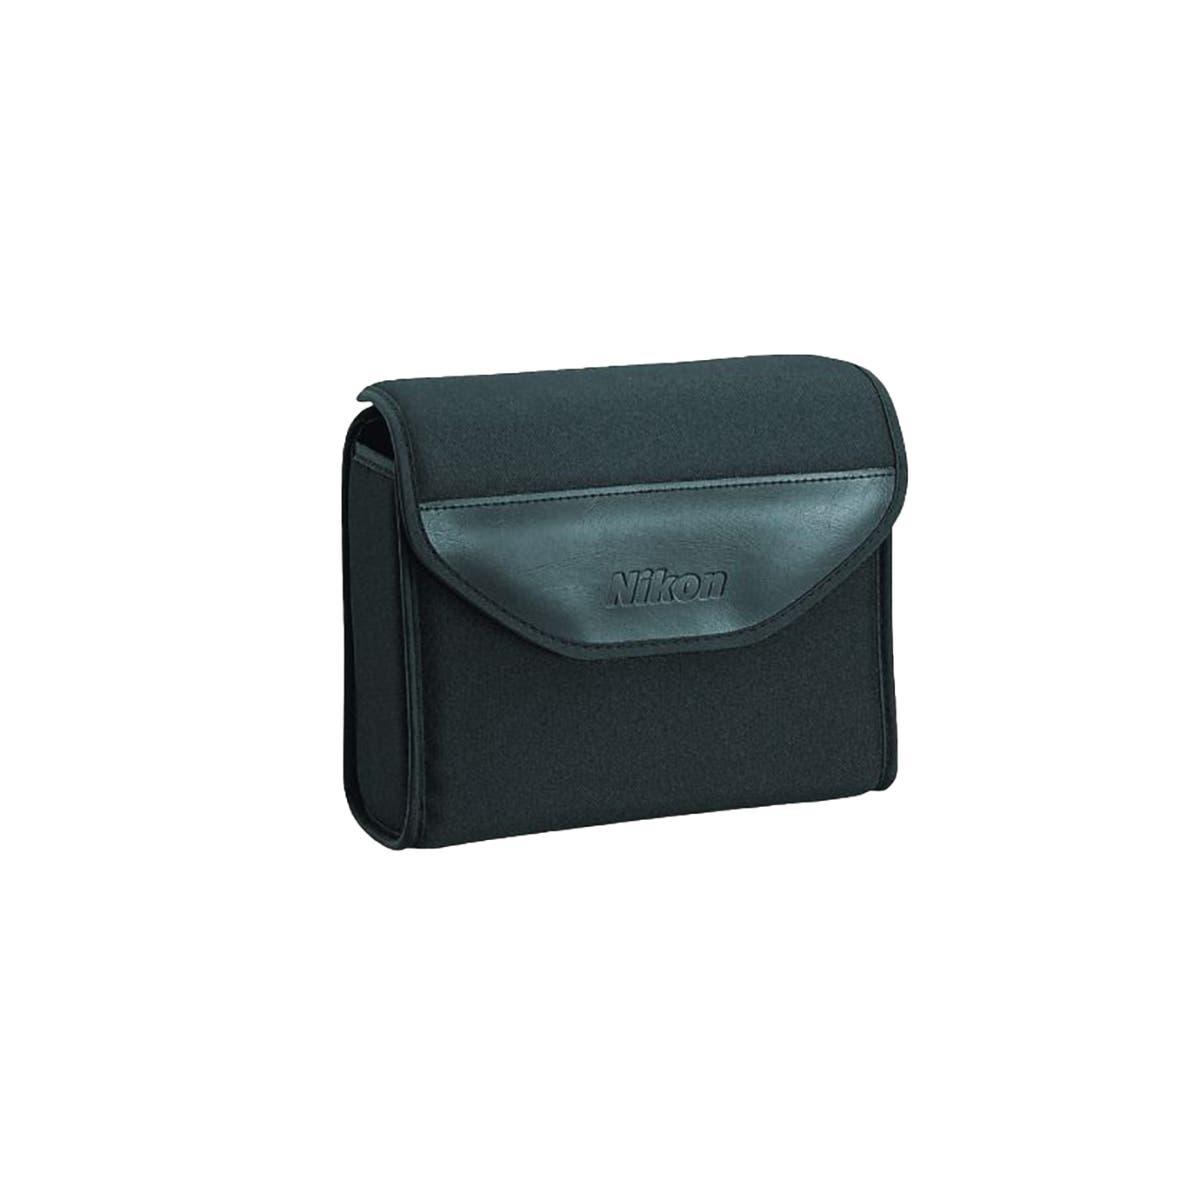 Aculon / Action EX 40mm case